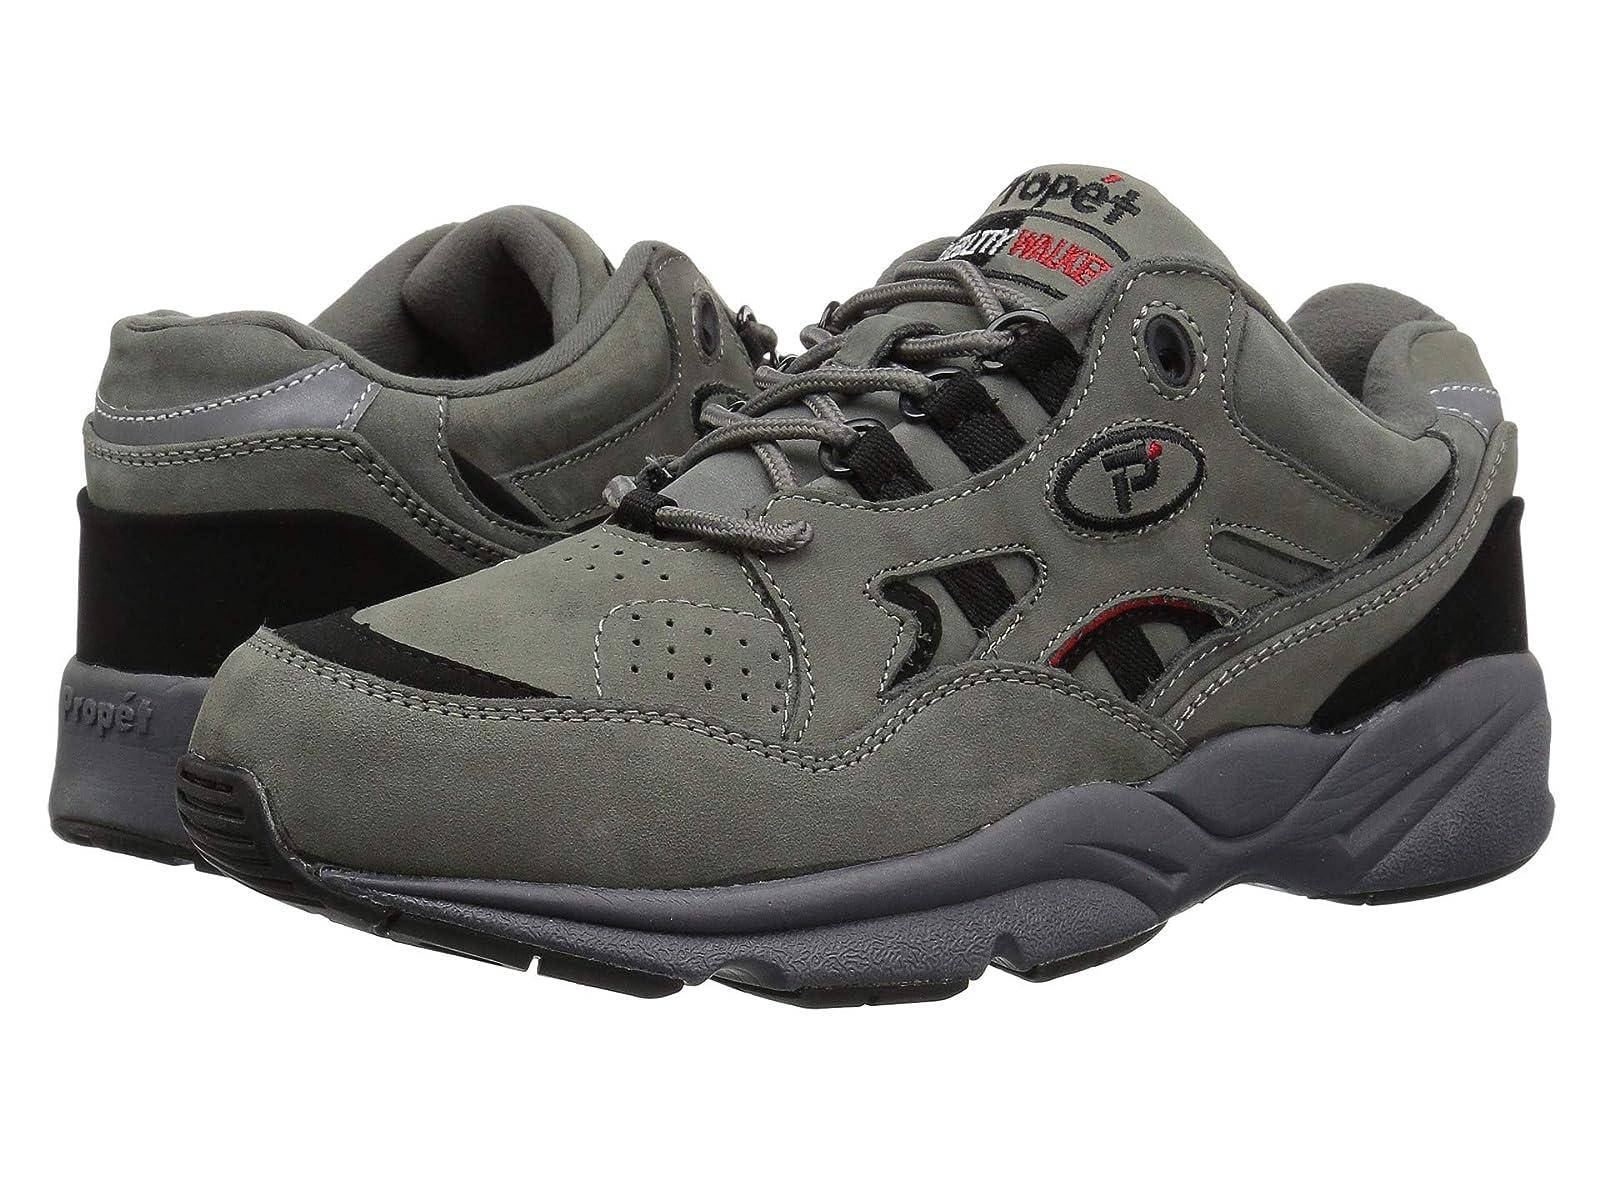 Propet Stability A5500 Walker Medicare/HCPCS Code = A5500 Stability Diabetic Shoe/cheaper/Man's/Woman's 28511b